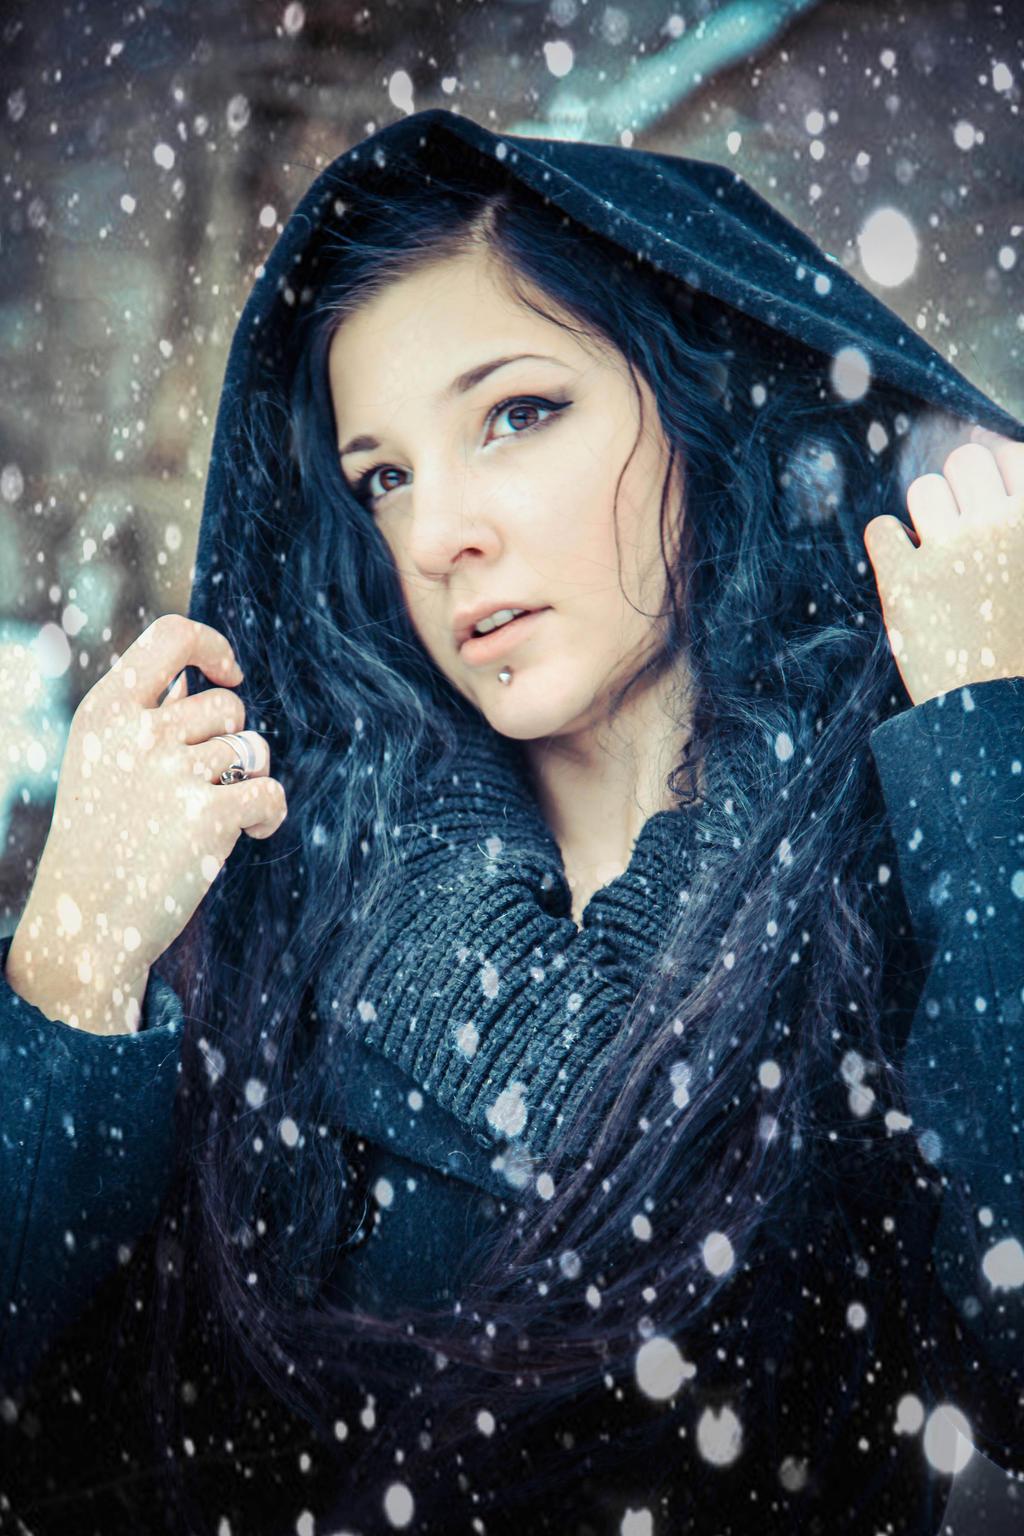 February snow by 13-Melissa-Salvatore